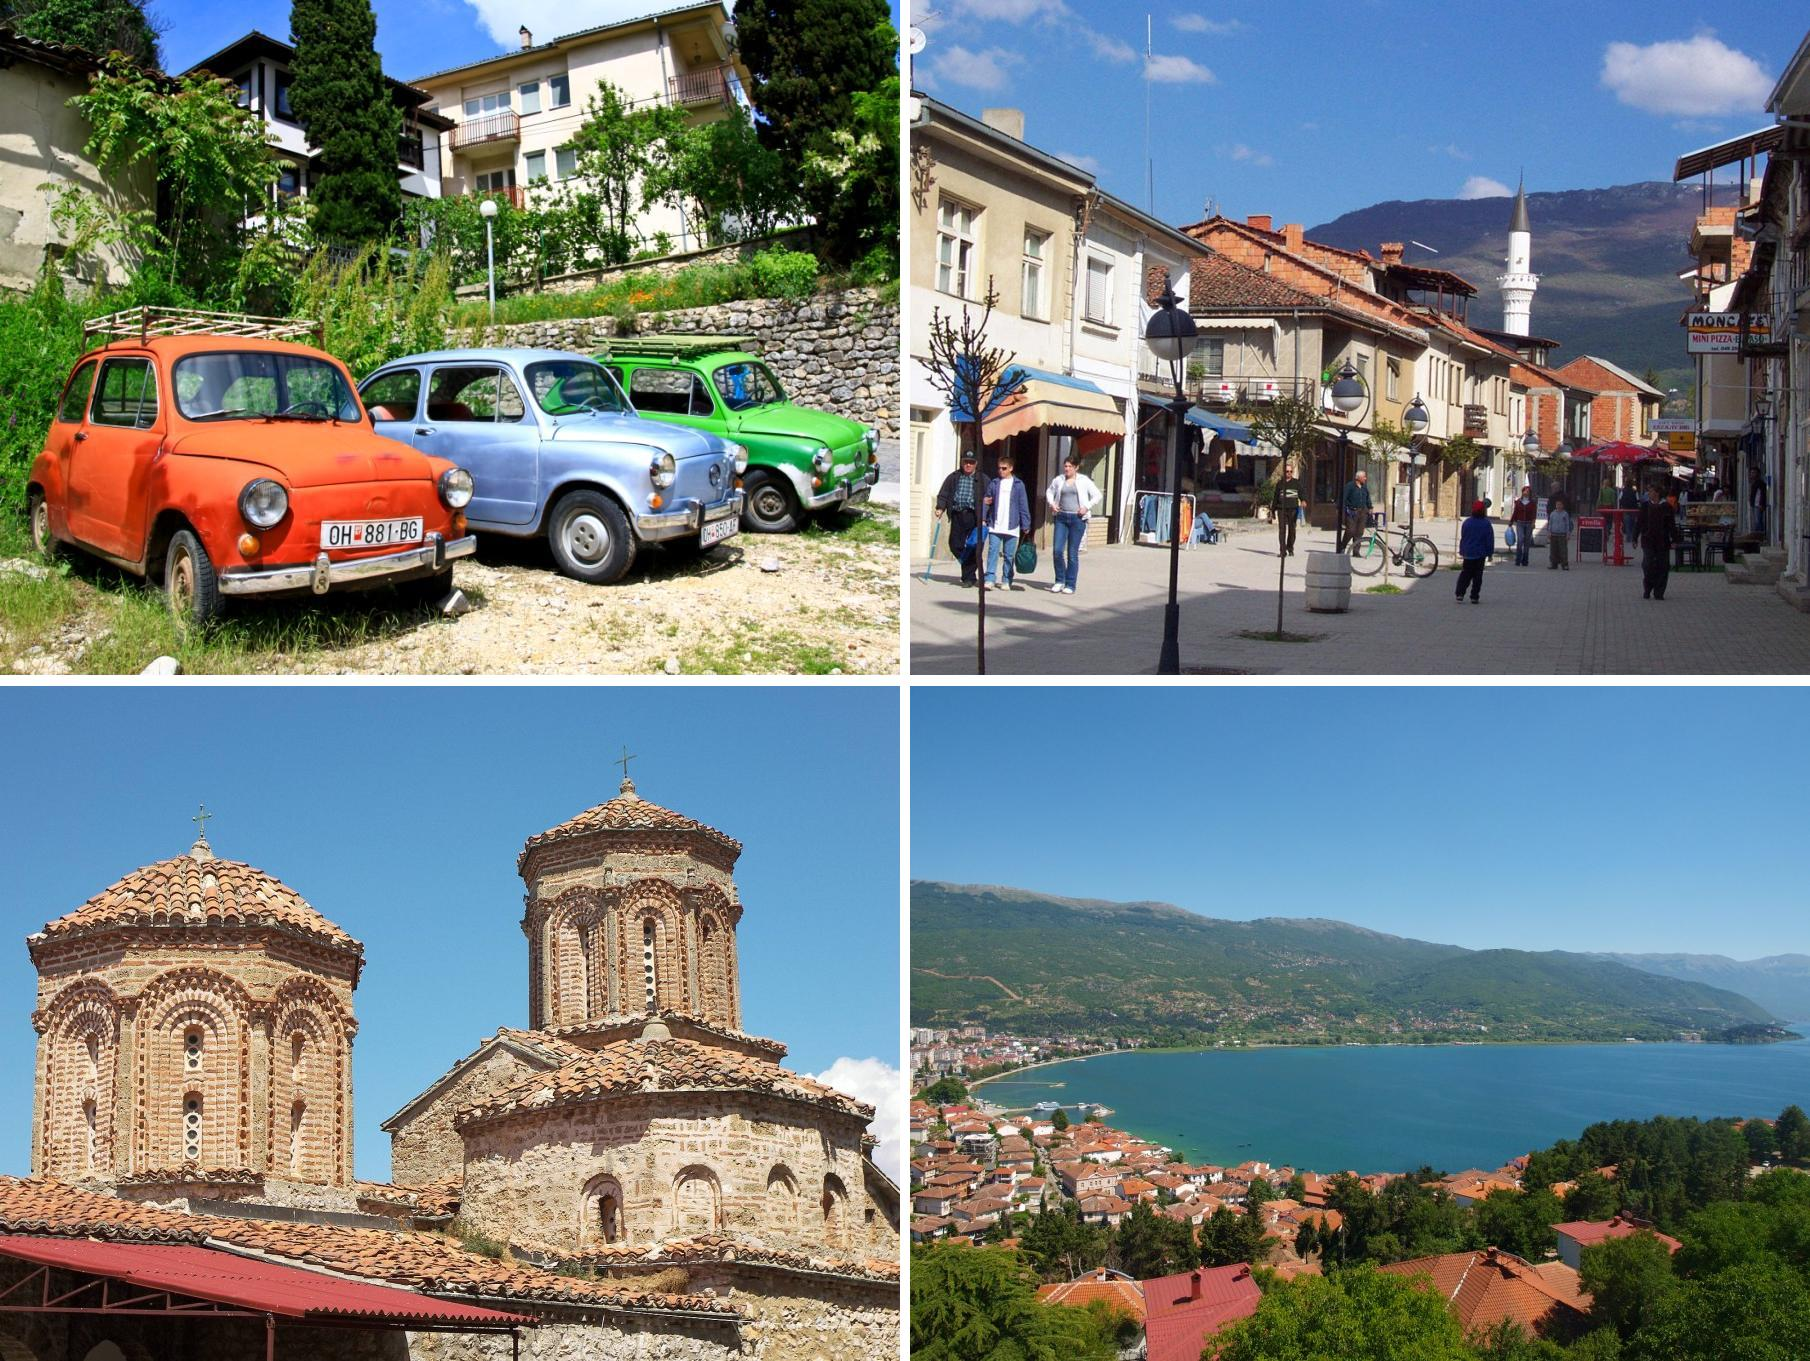 Reisregisseur - Macedonie - Skopje en Ohrid